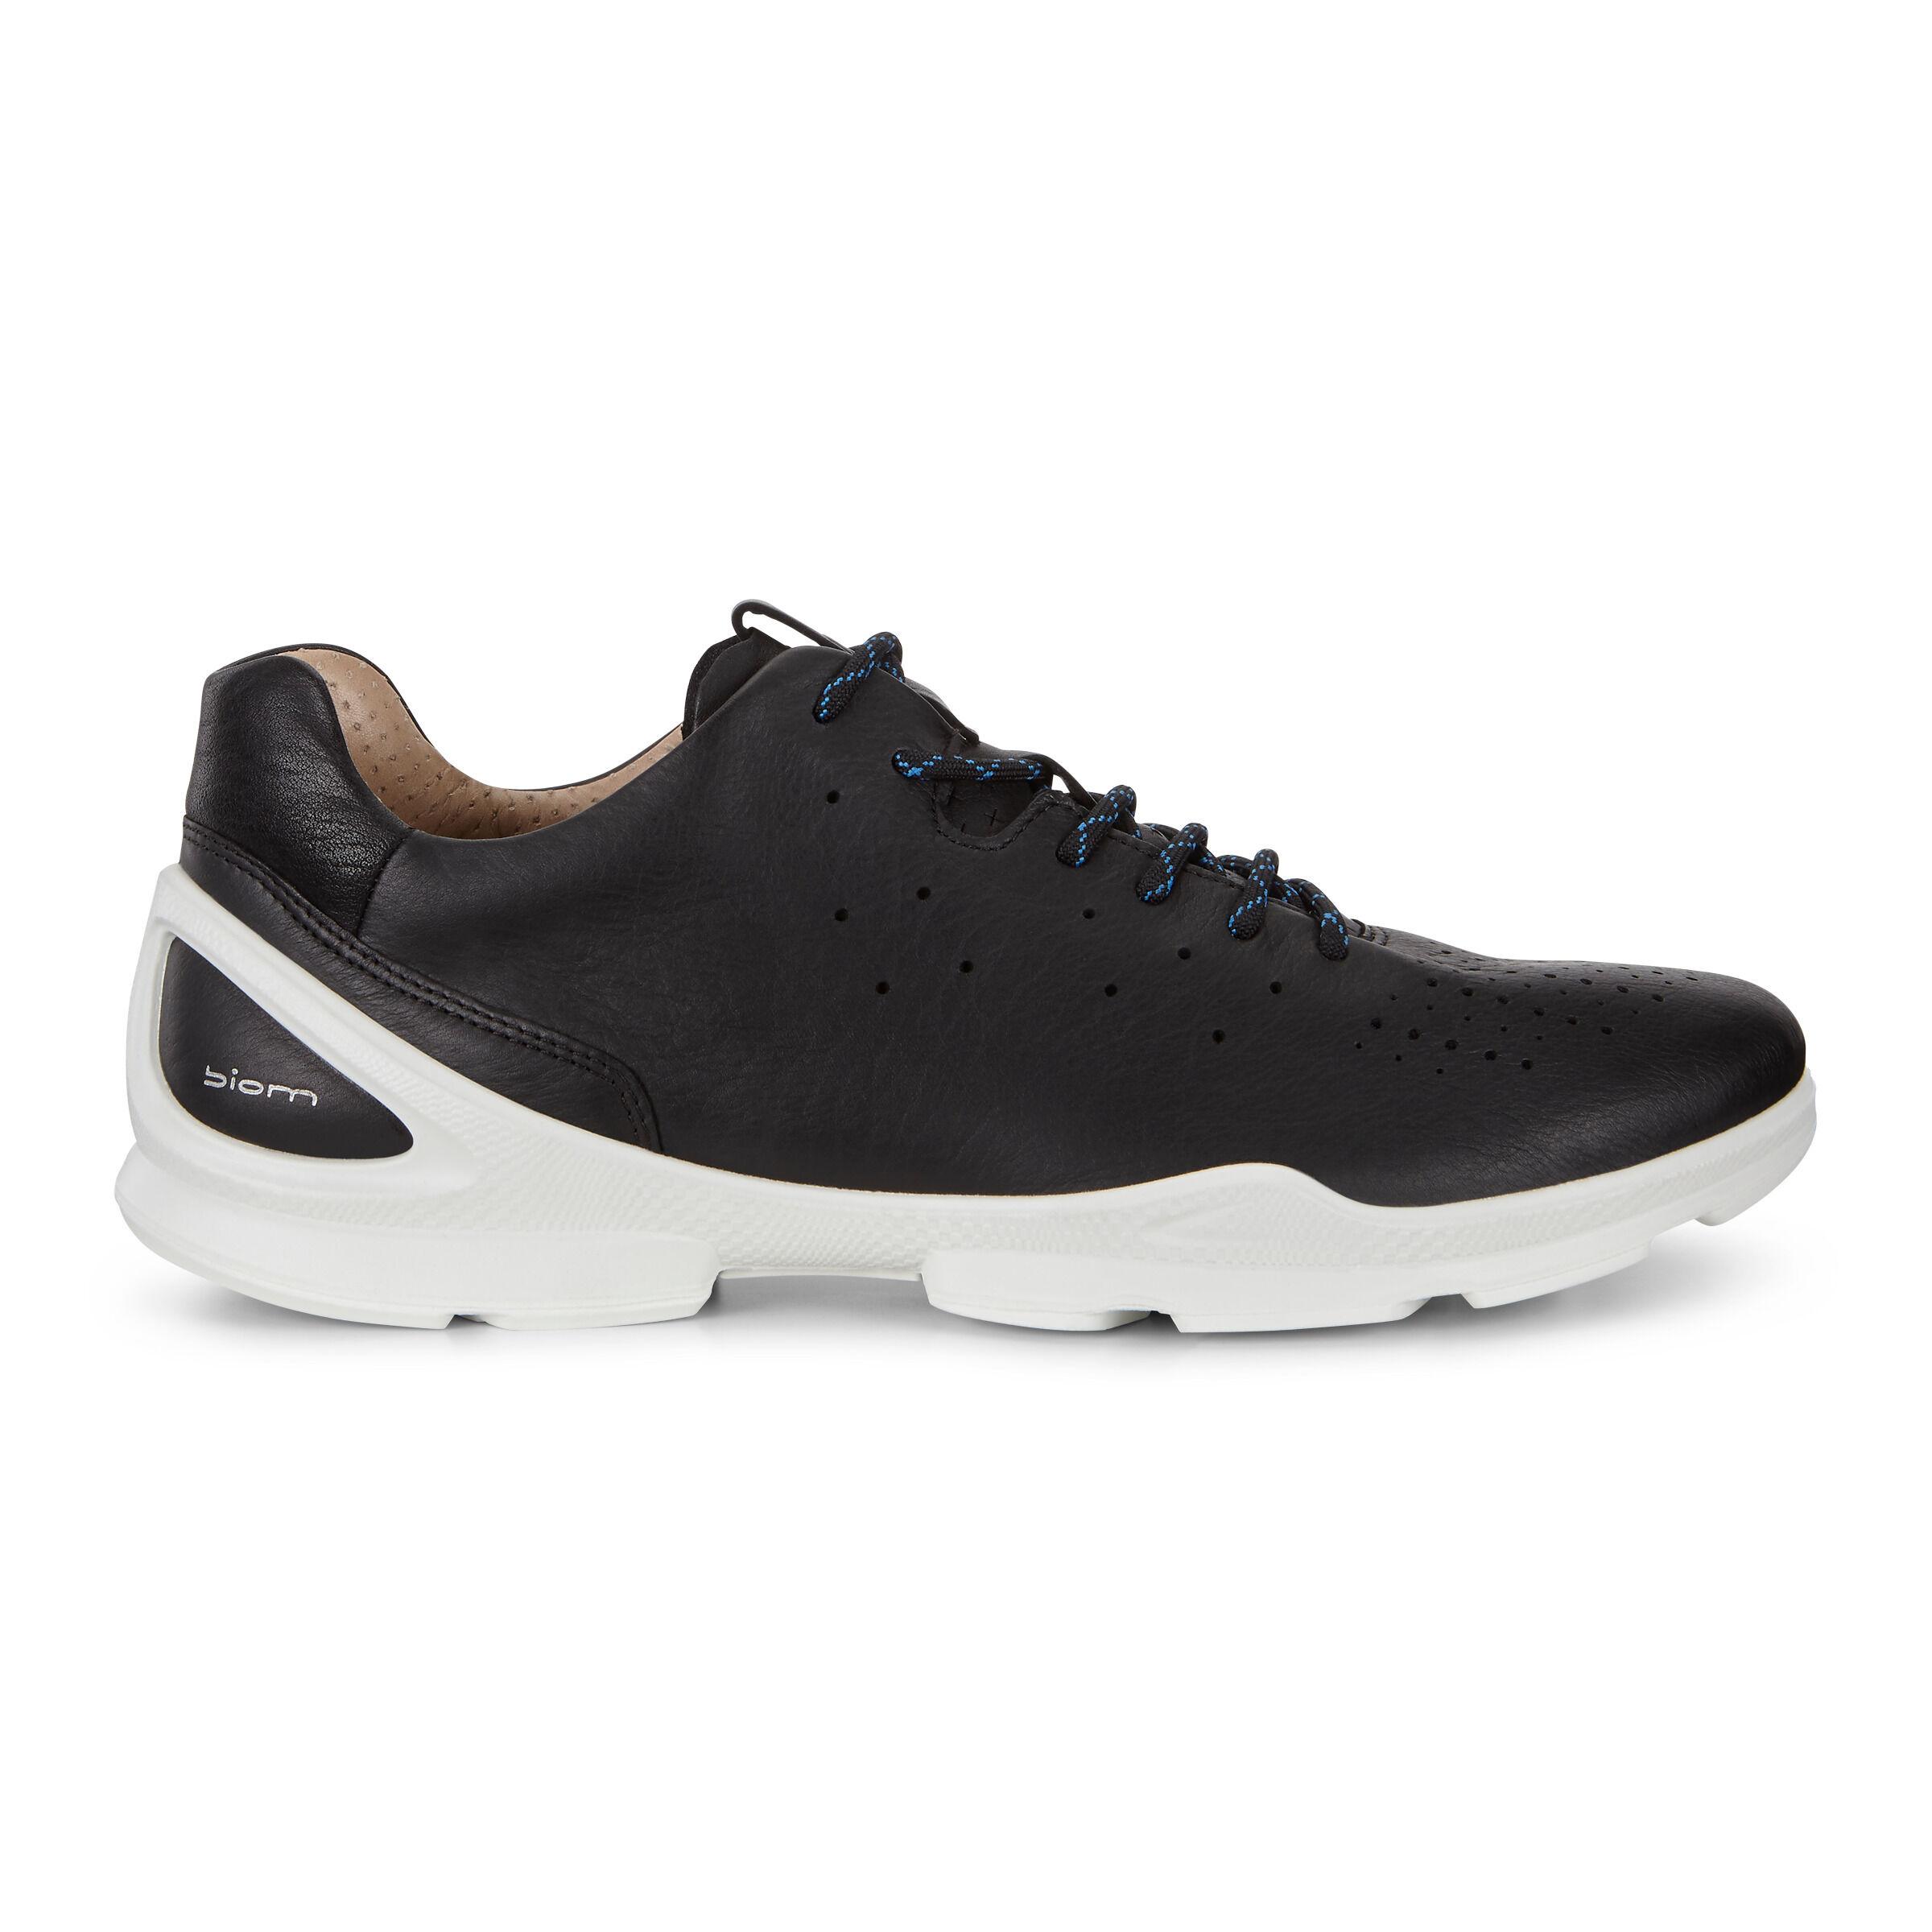 Casual BIOM Shoes   ECCO® Shoes